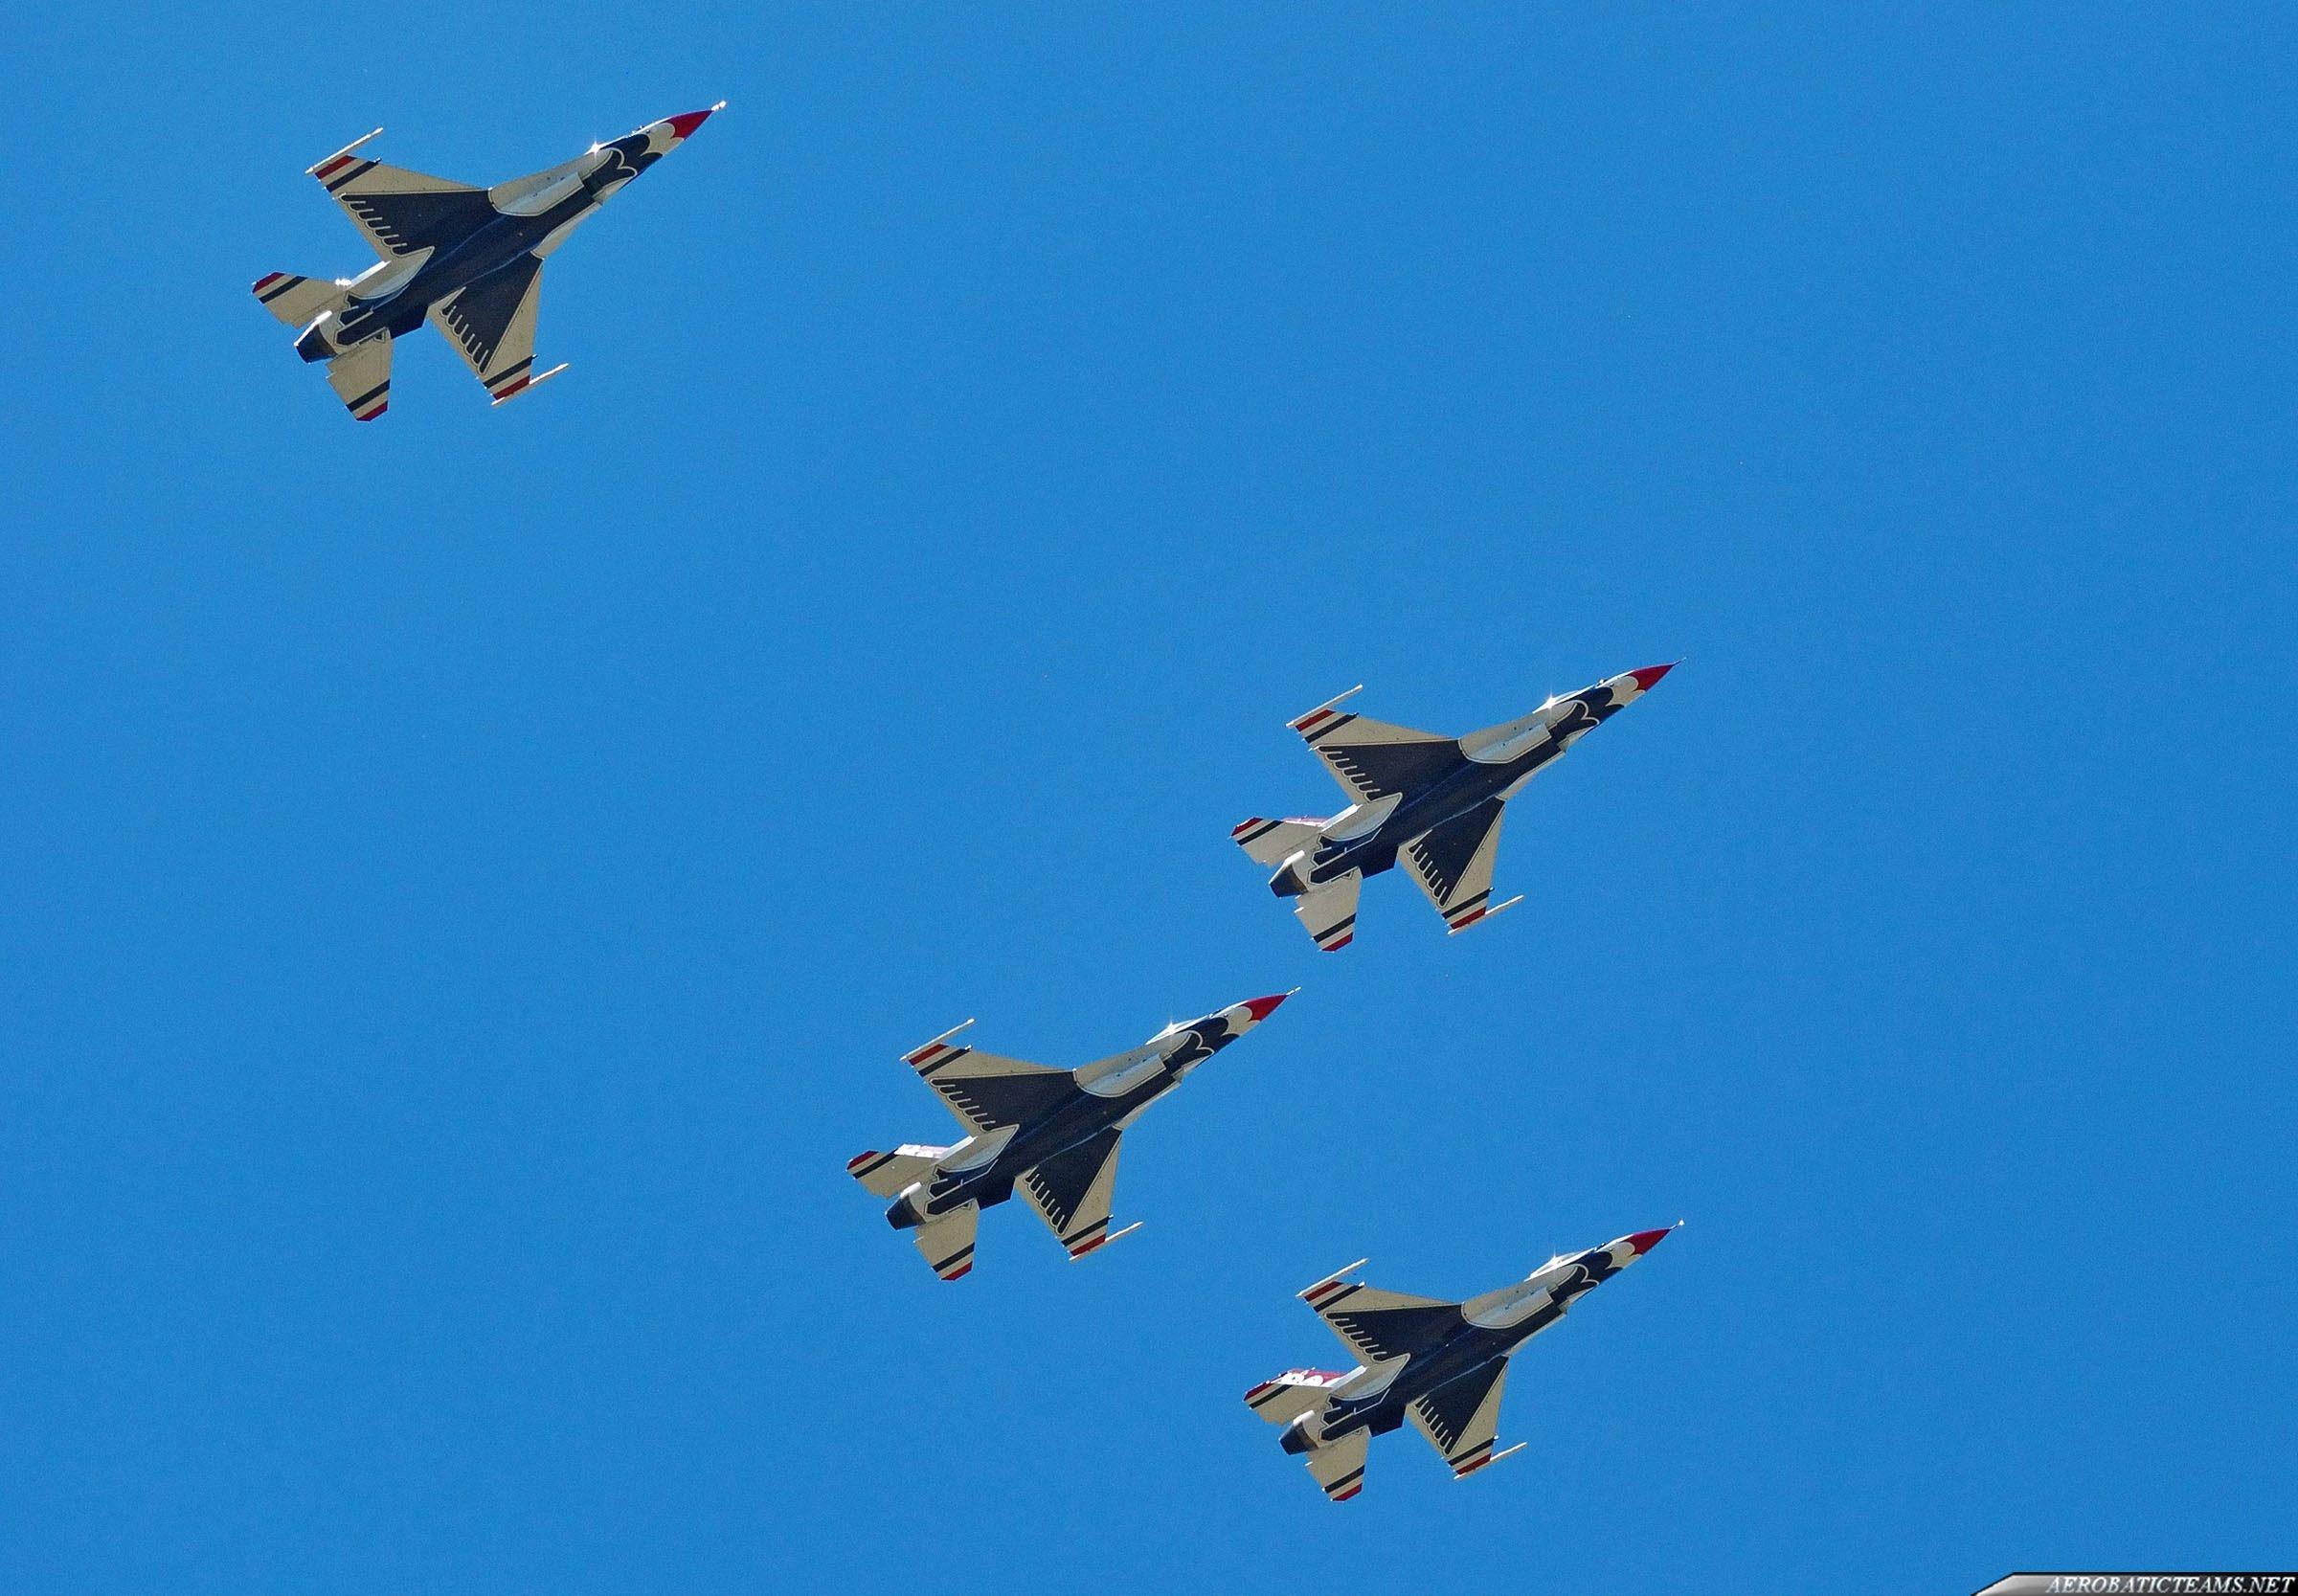 Recognishion flight